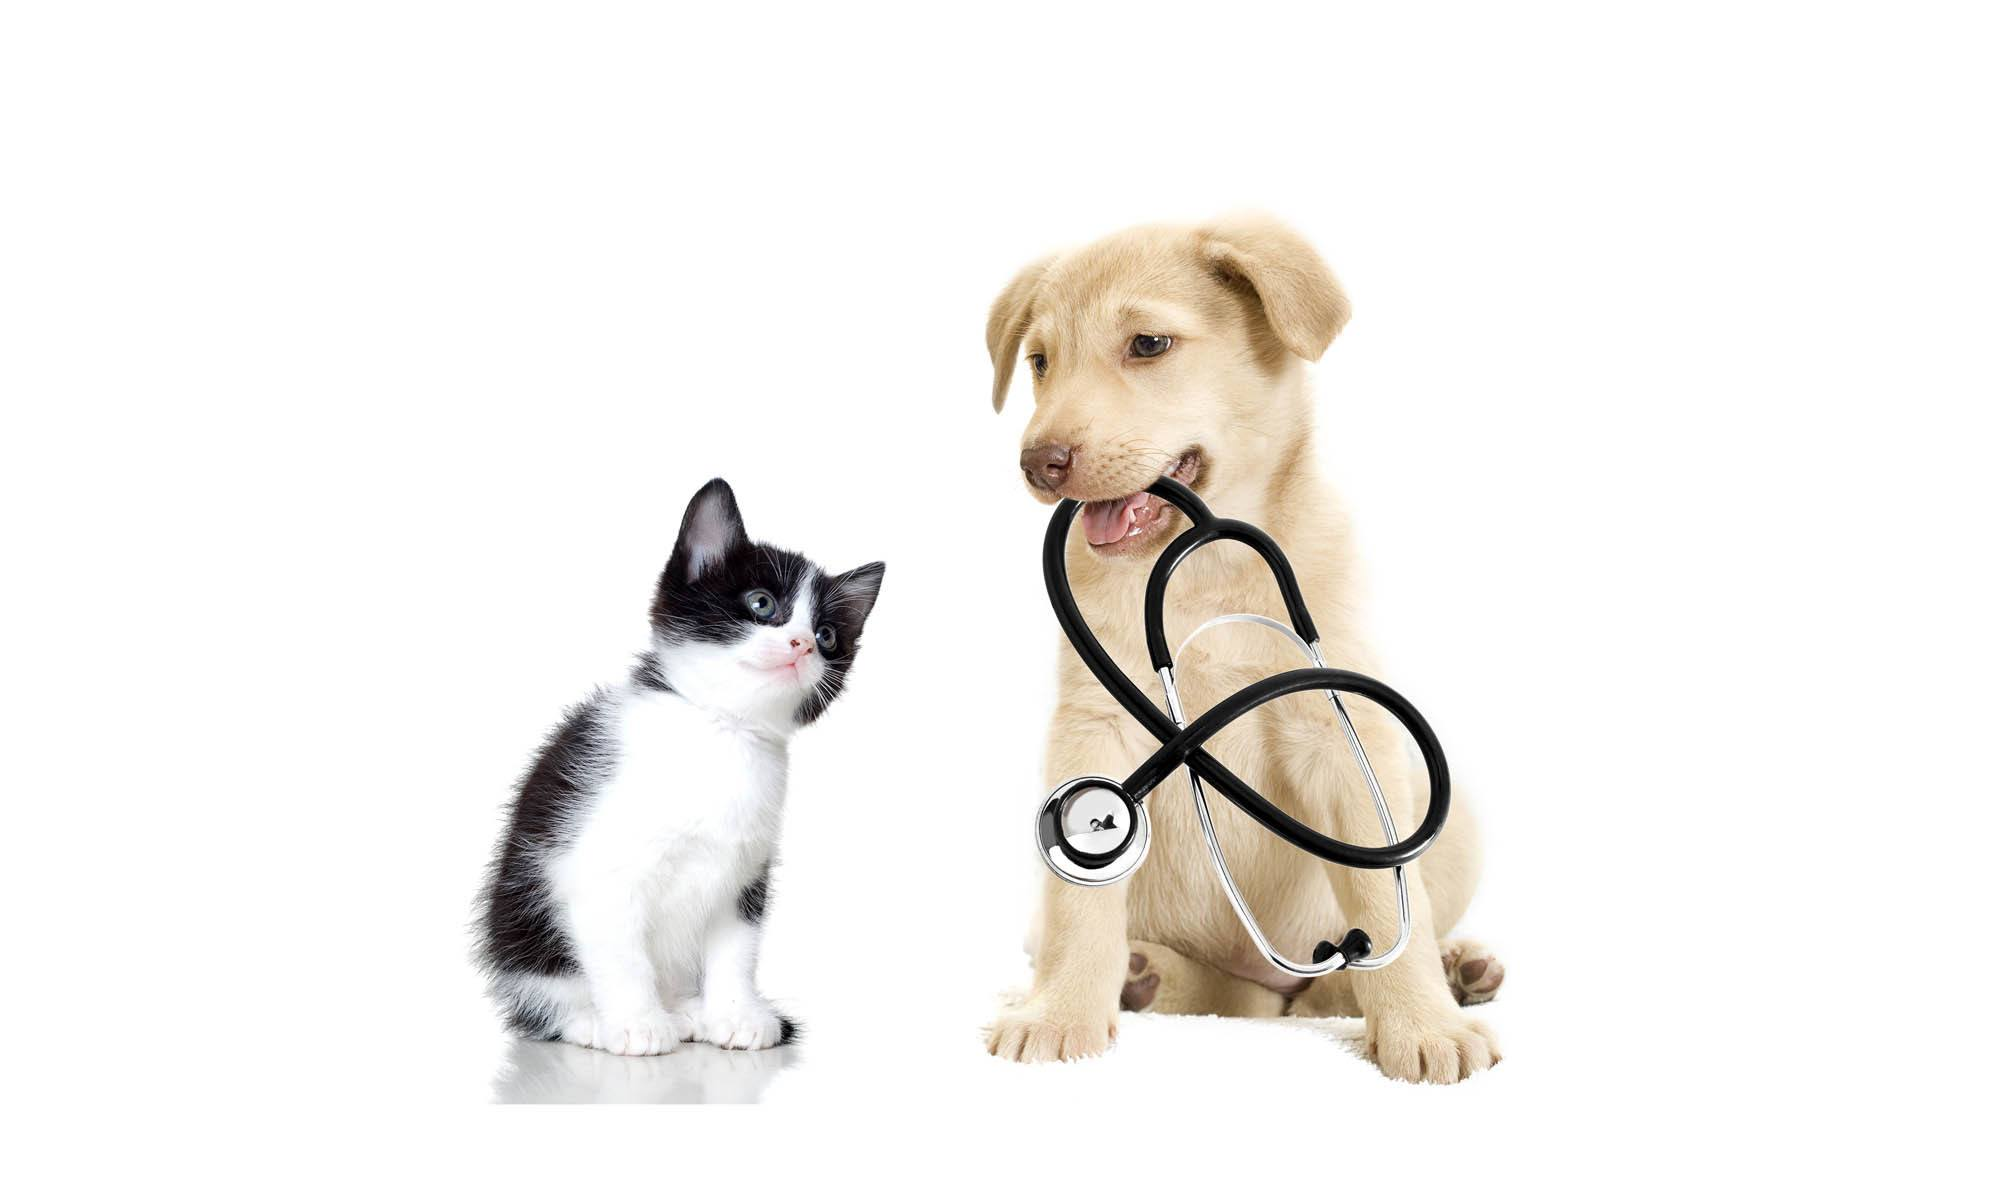 Animal hospital in Lake Havasu City, AZ